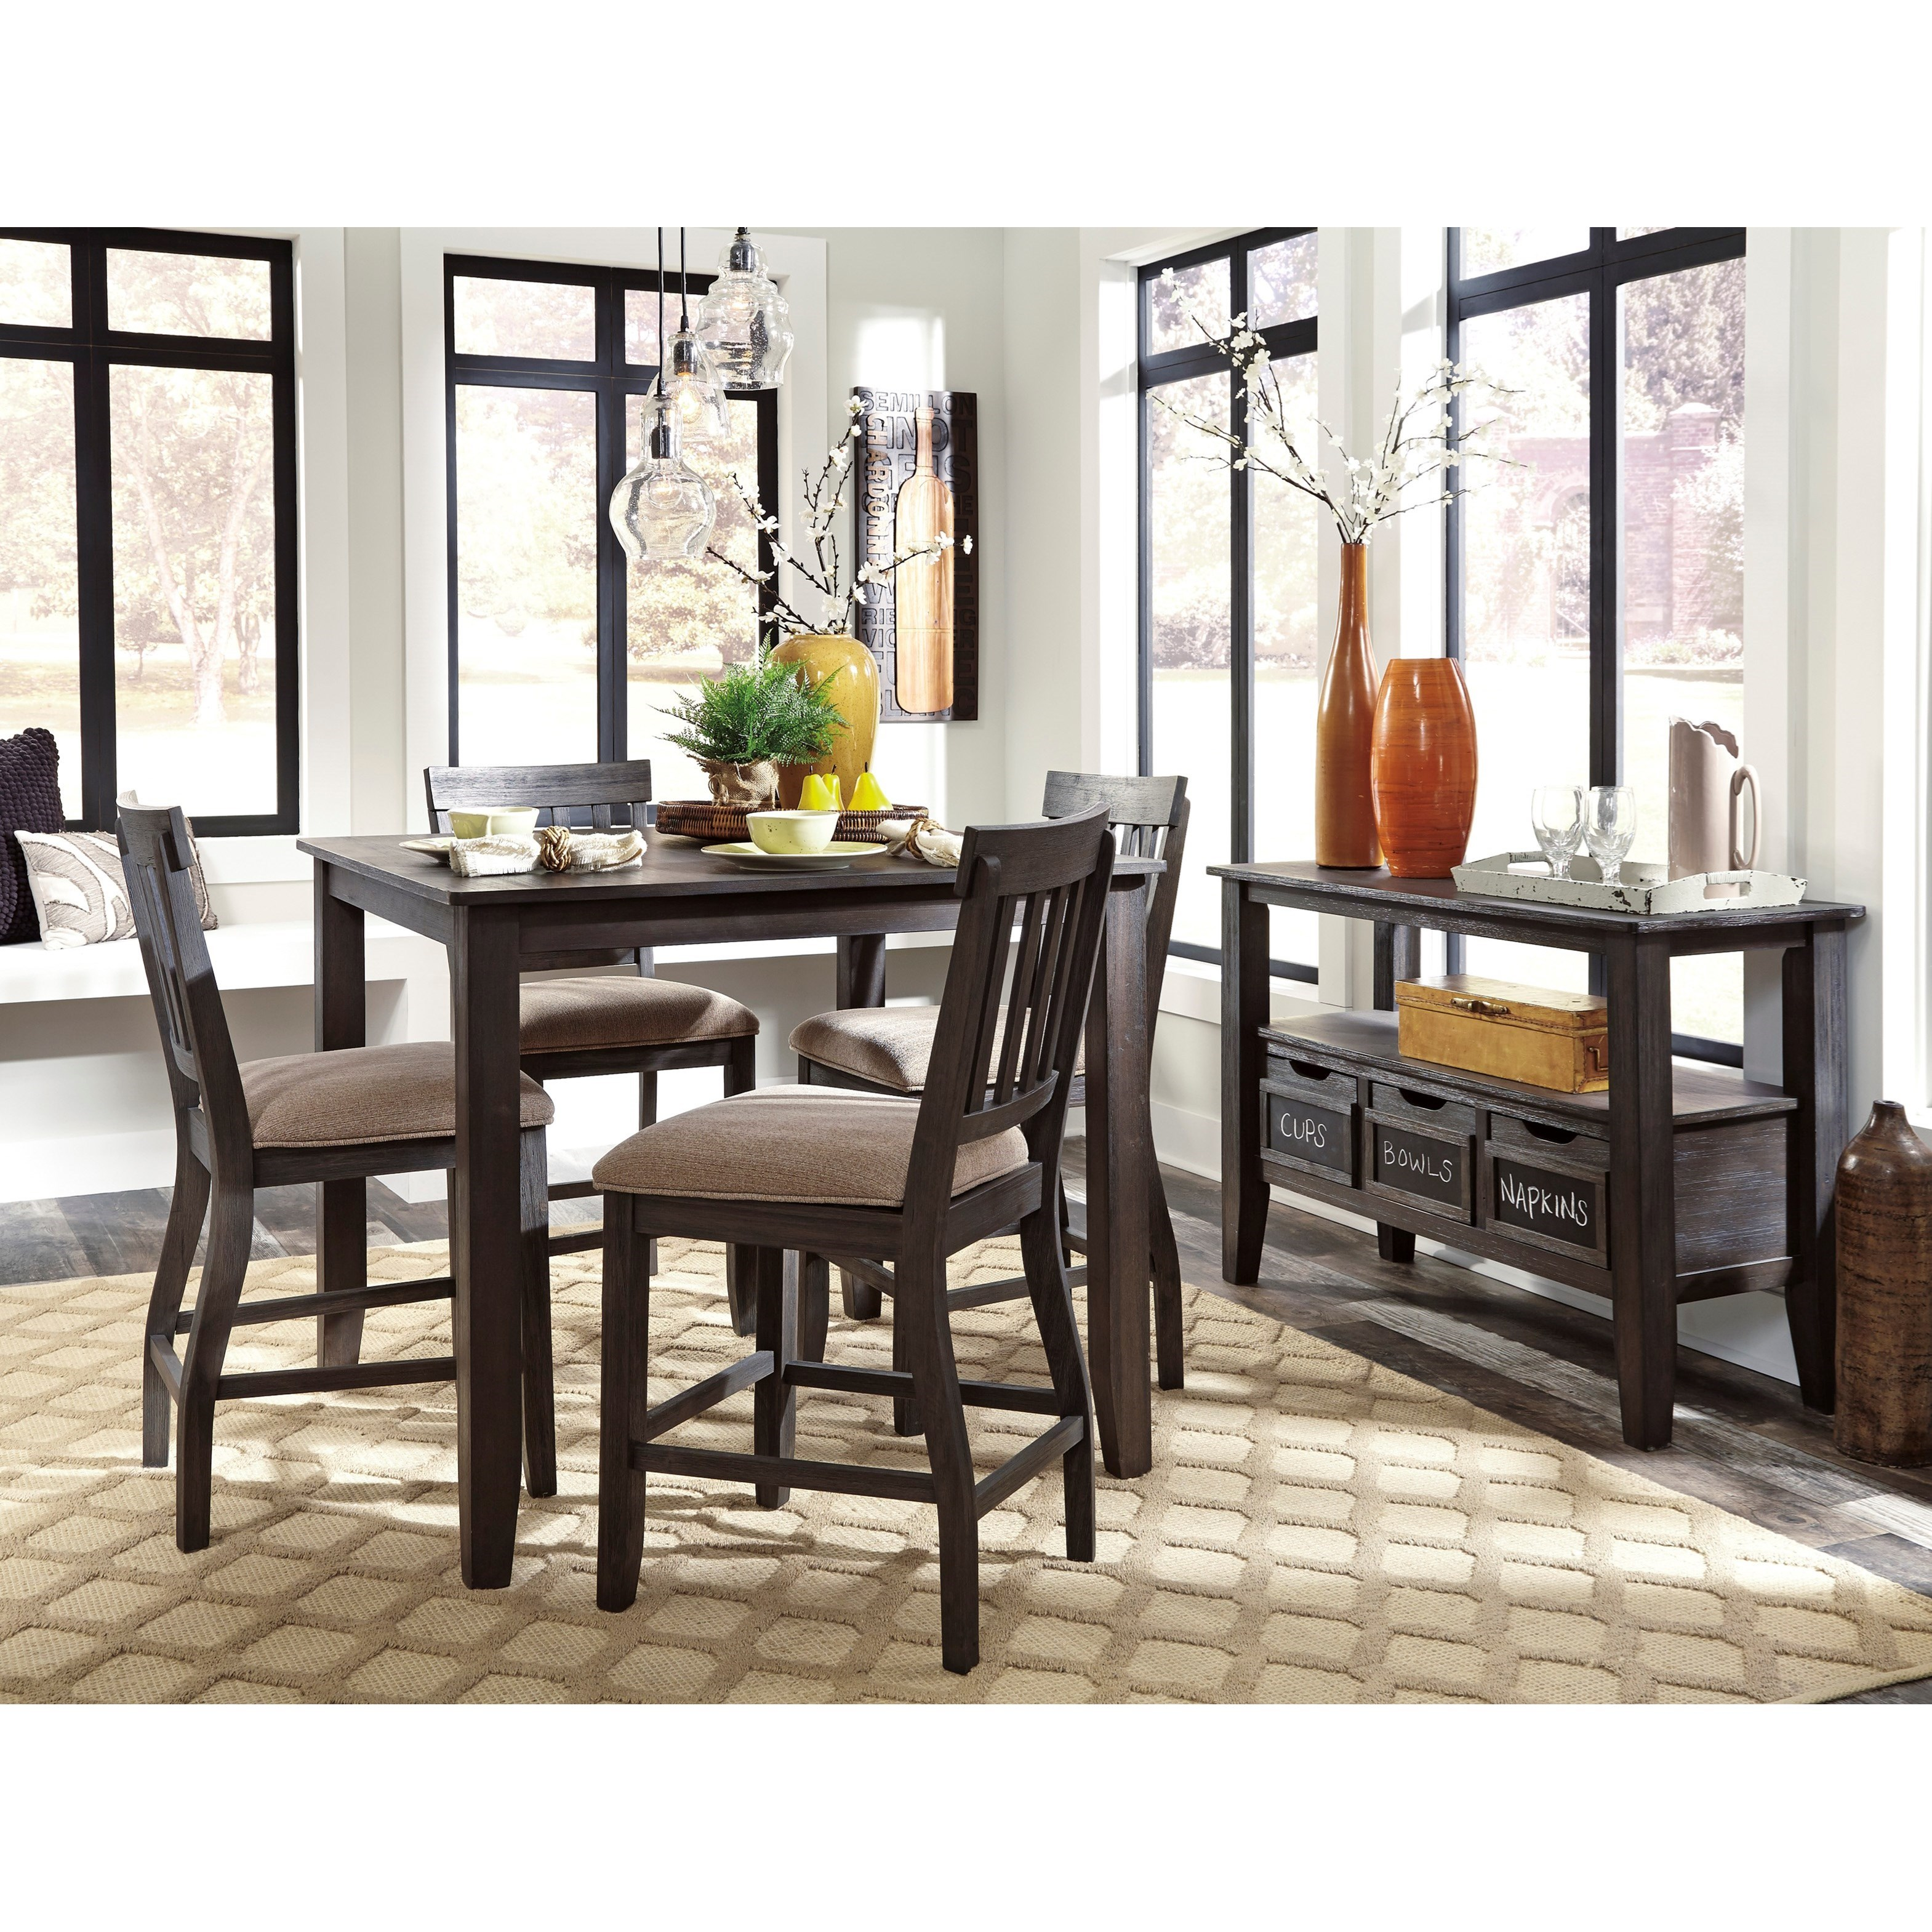 Dining room servers furniture